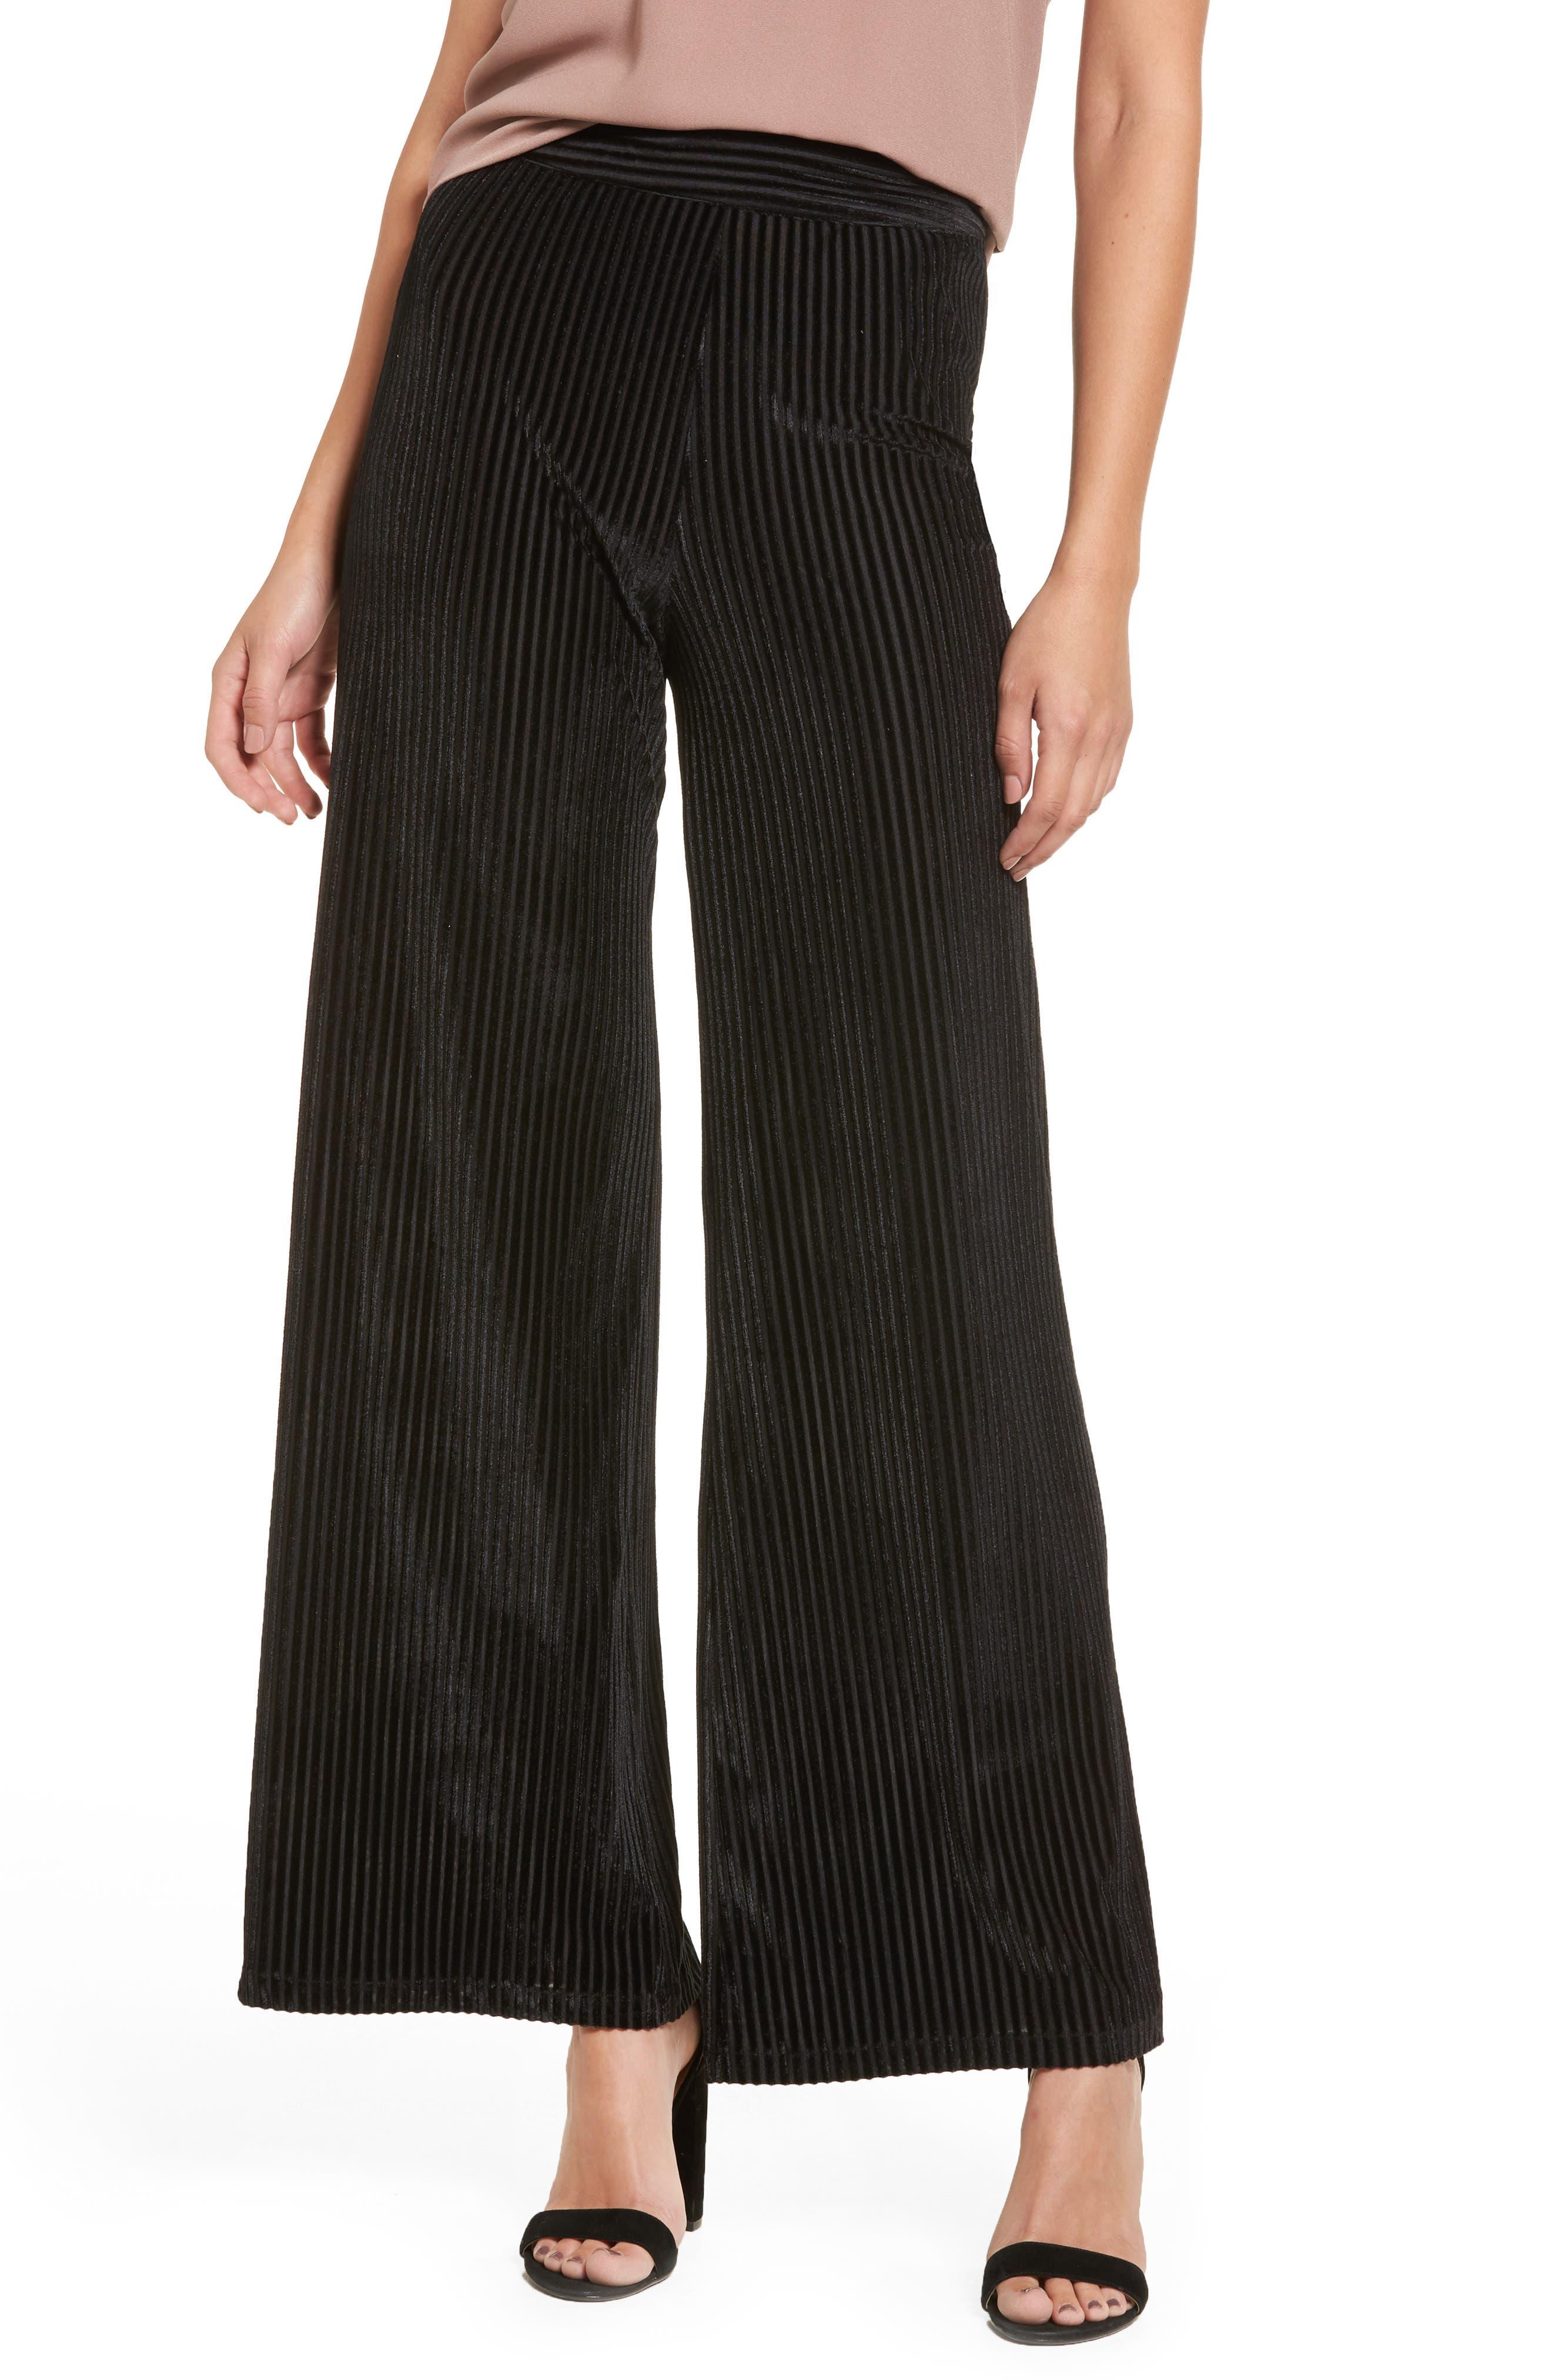 Marley Velvet Pants,                         Main,                         color, 001